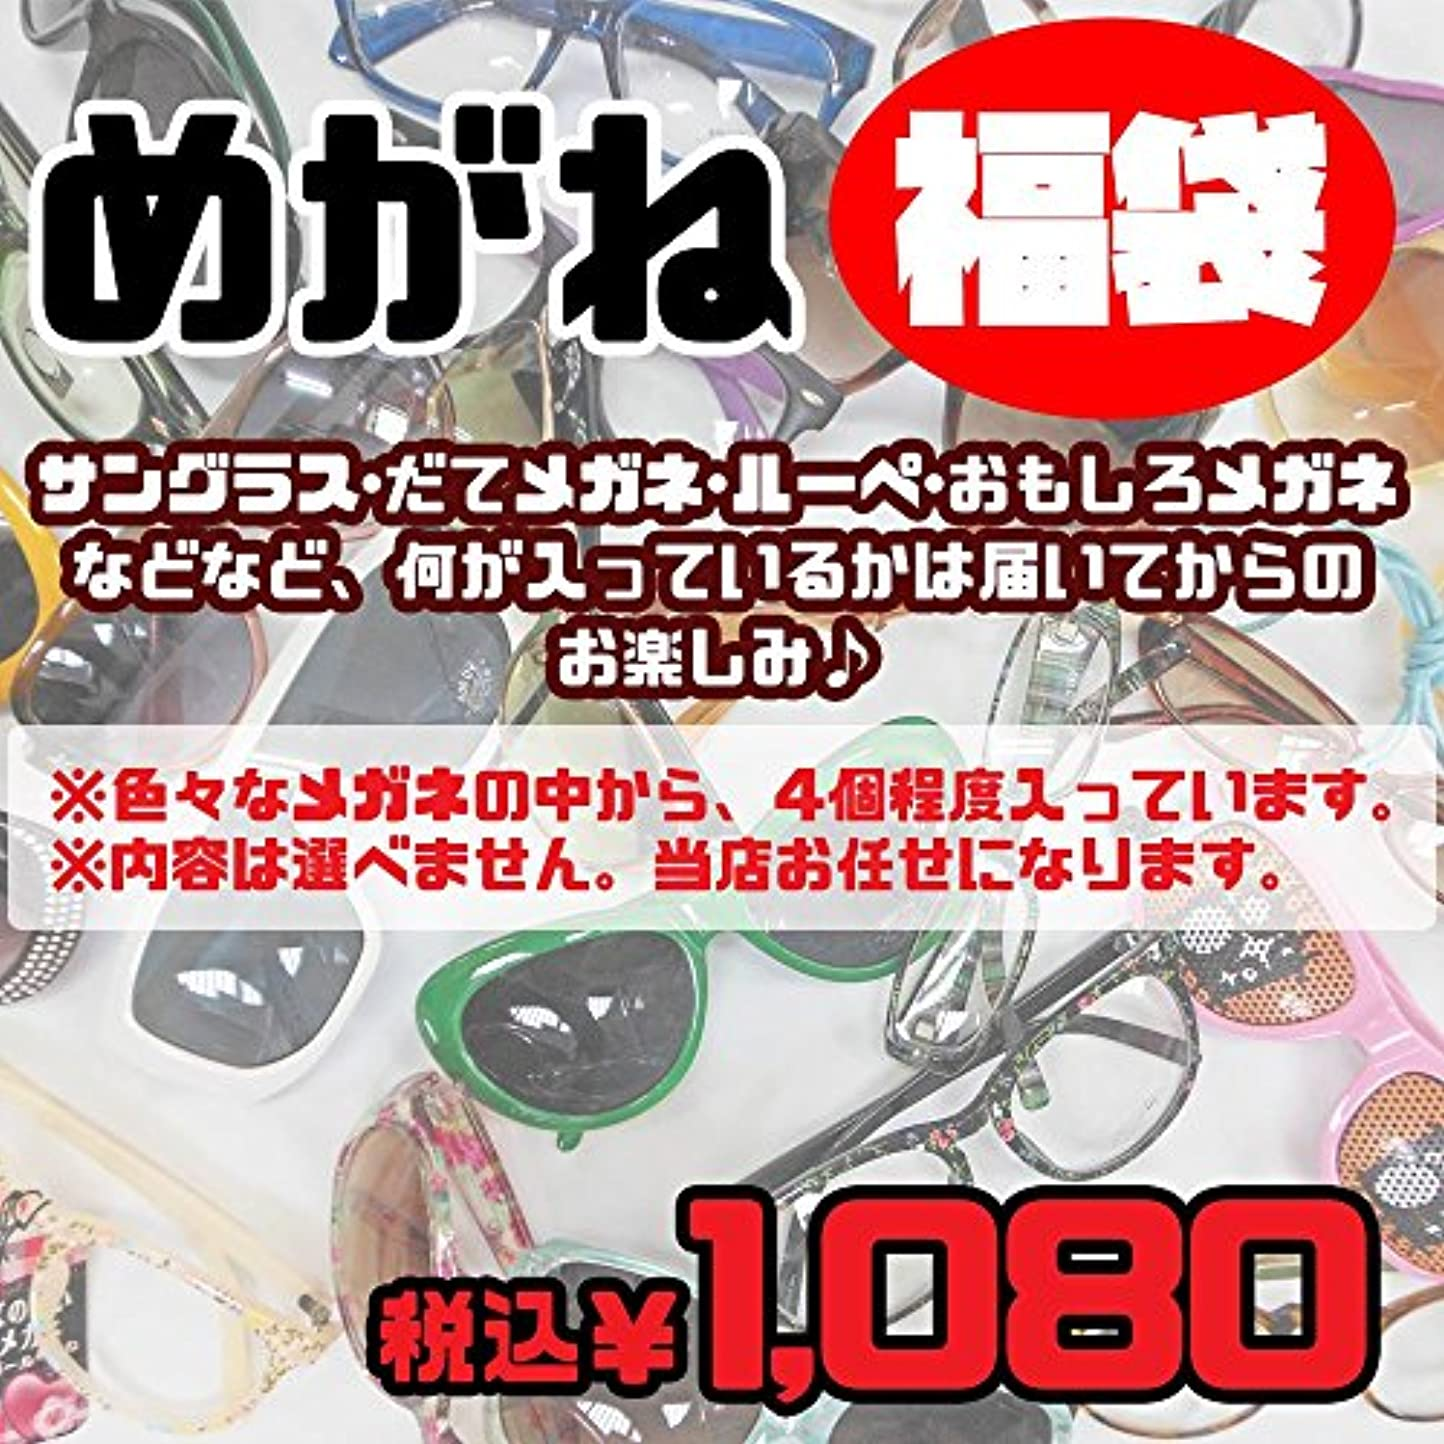 FUKU-18736/中身はおまかせ!サングラス&伊達メガネ4個セット/詰め合わせ/お得/眼鏡/セット/ギフト/プレゼント